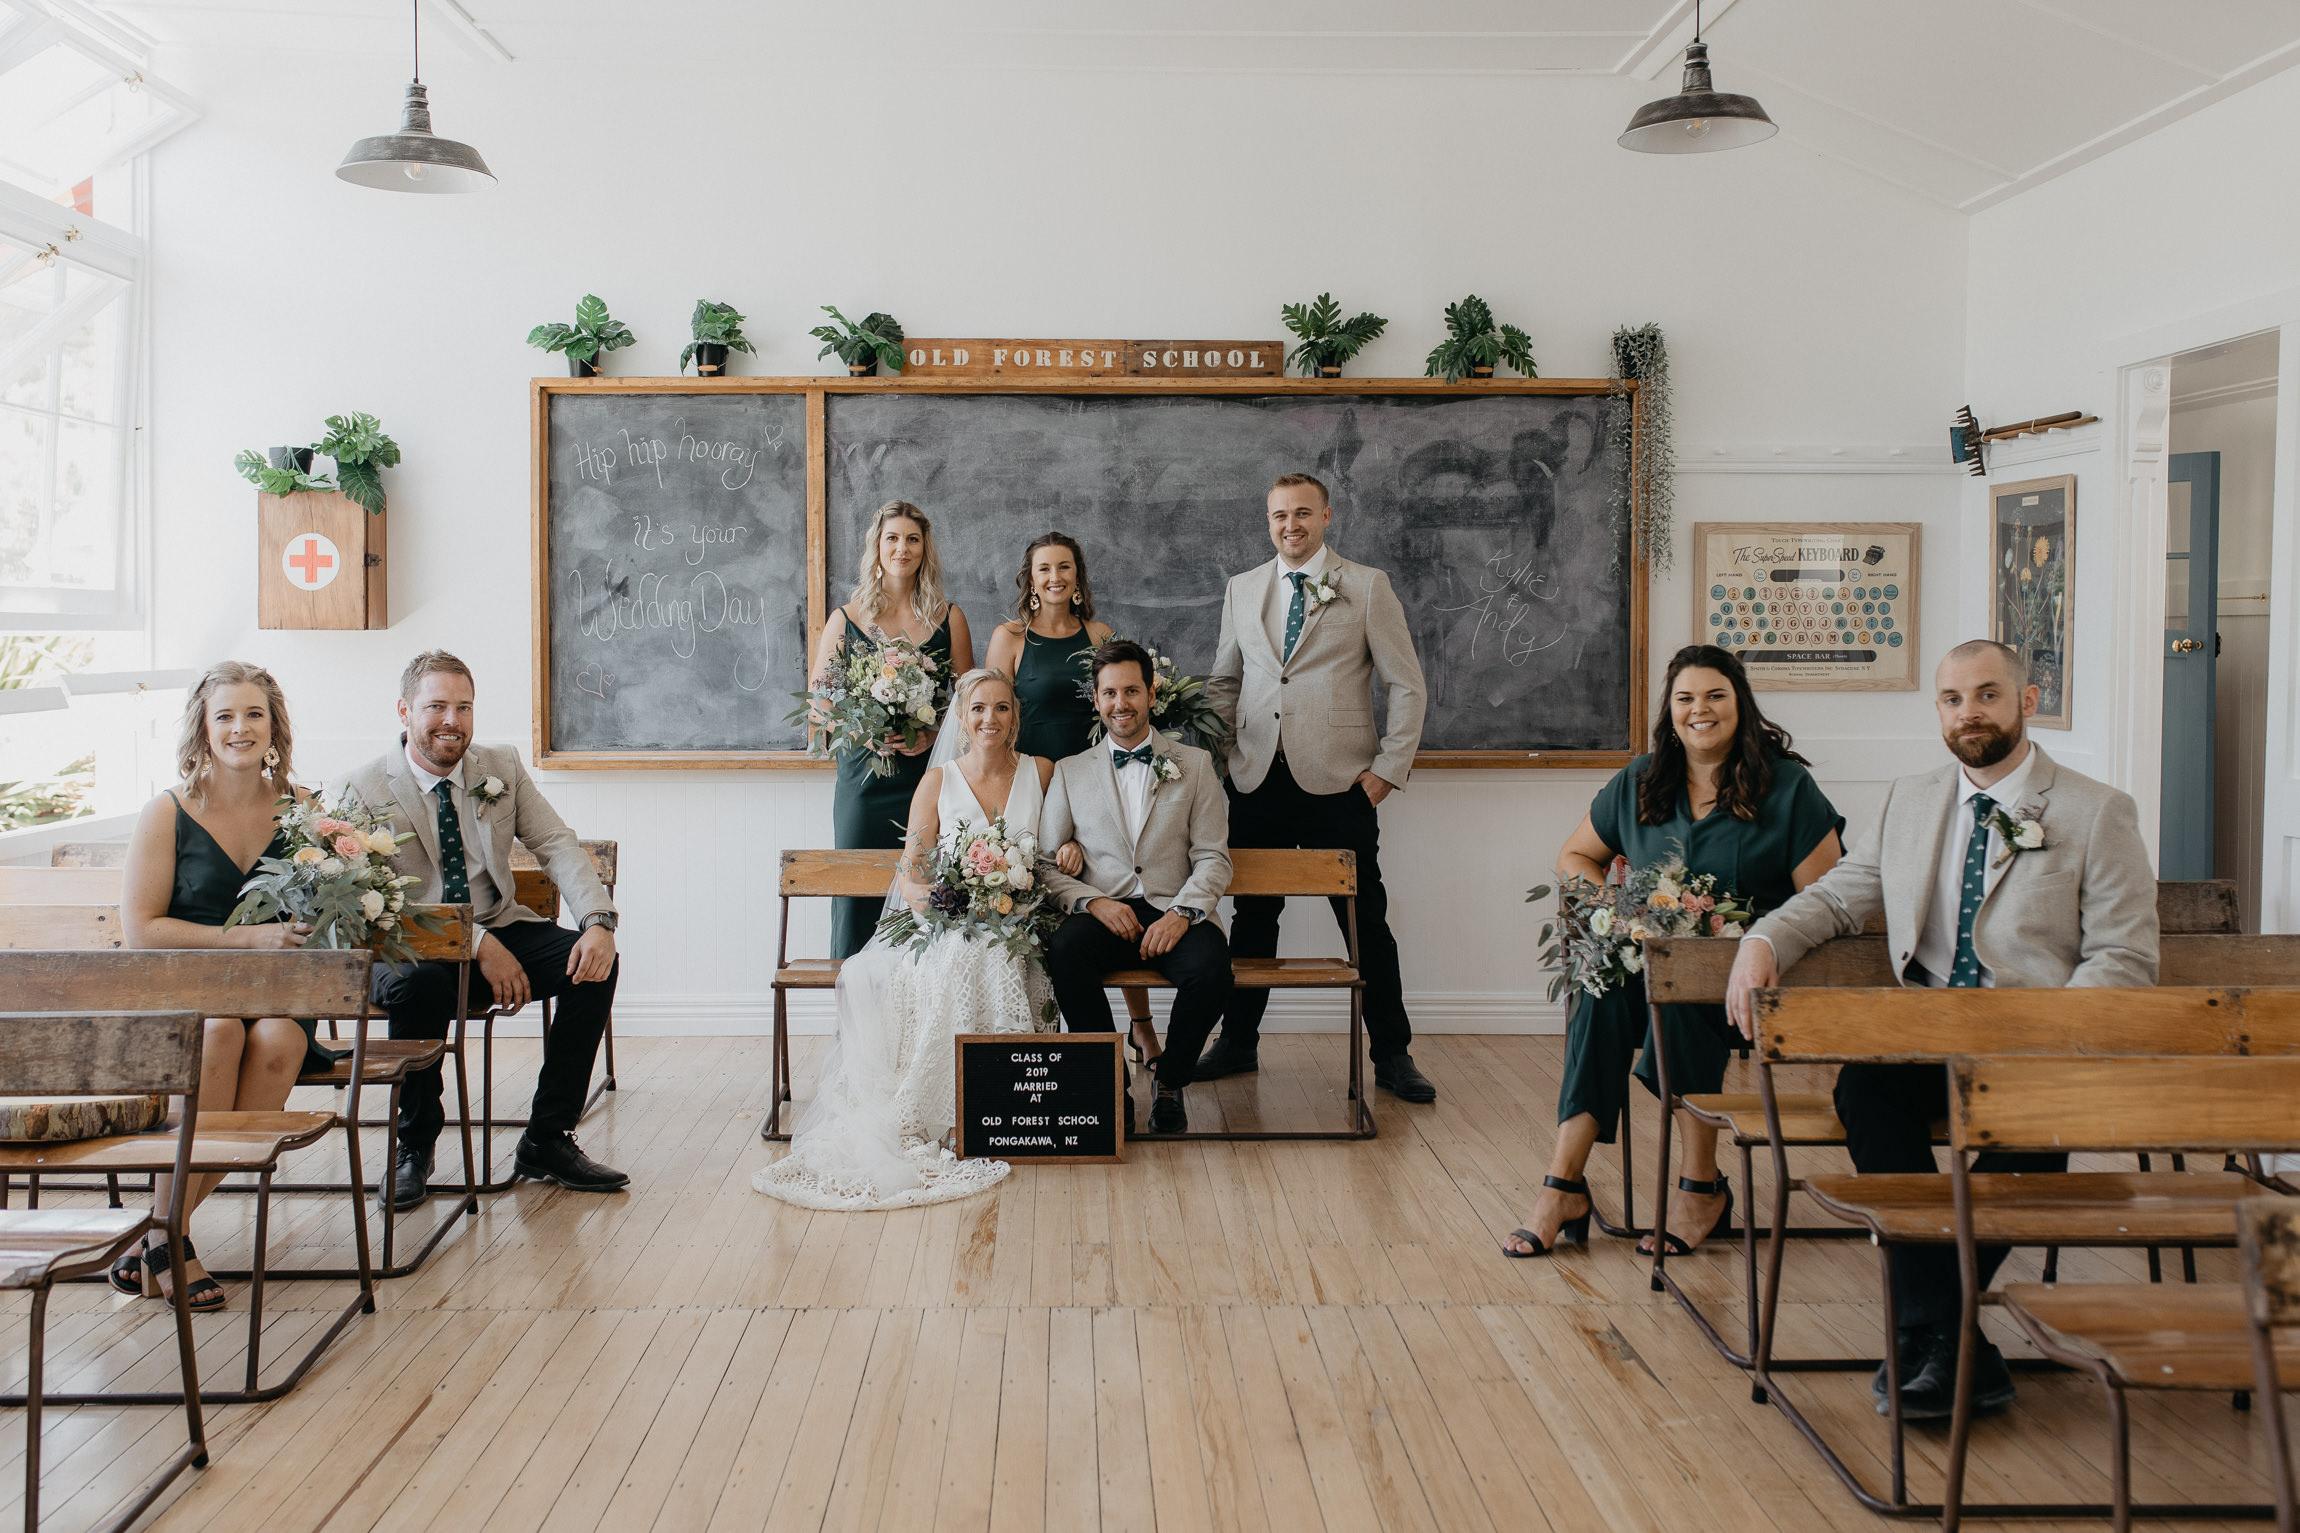 oldforestschool-wedding-blog-69.jpg